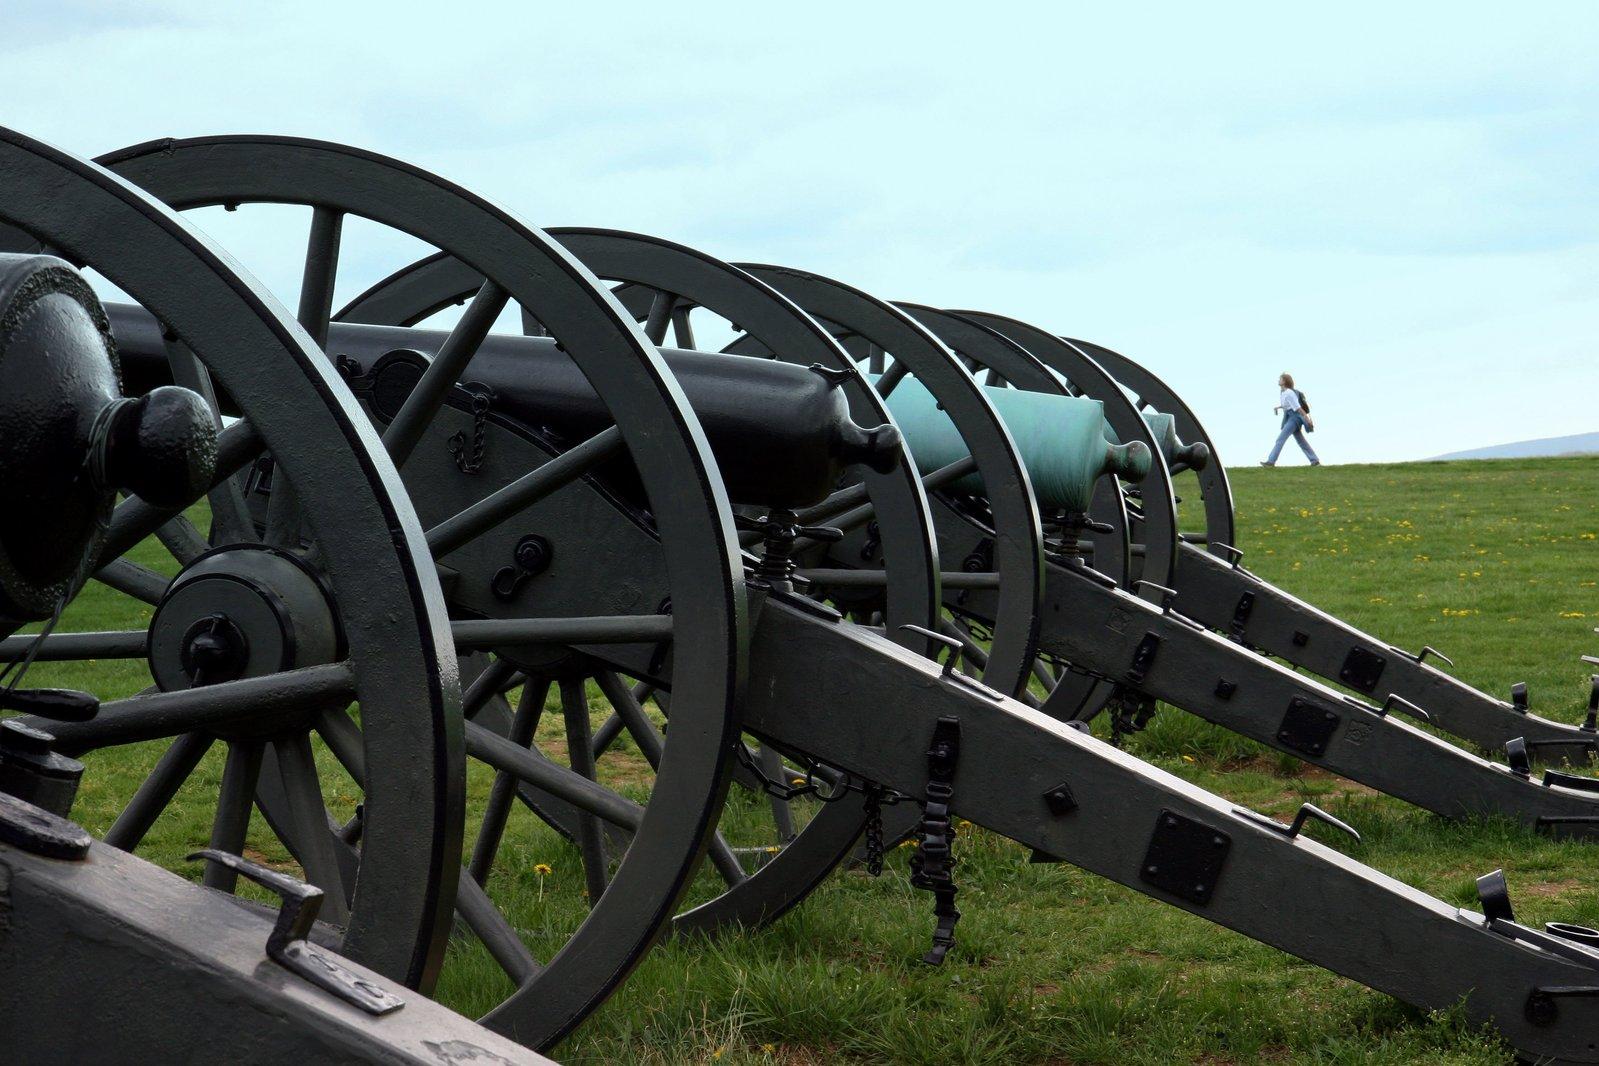 Napoleonic cannon